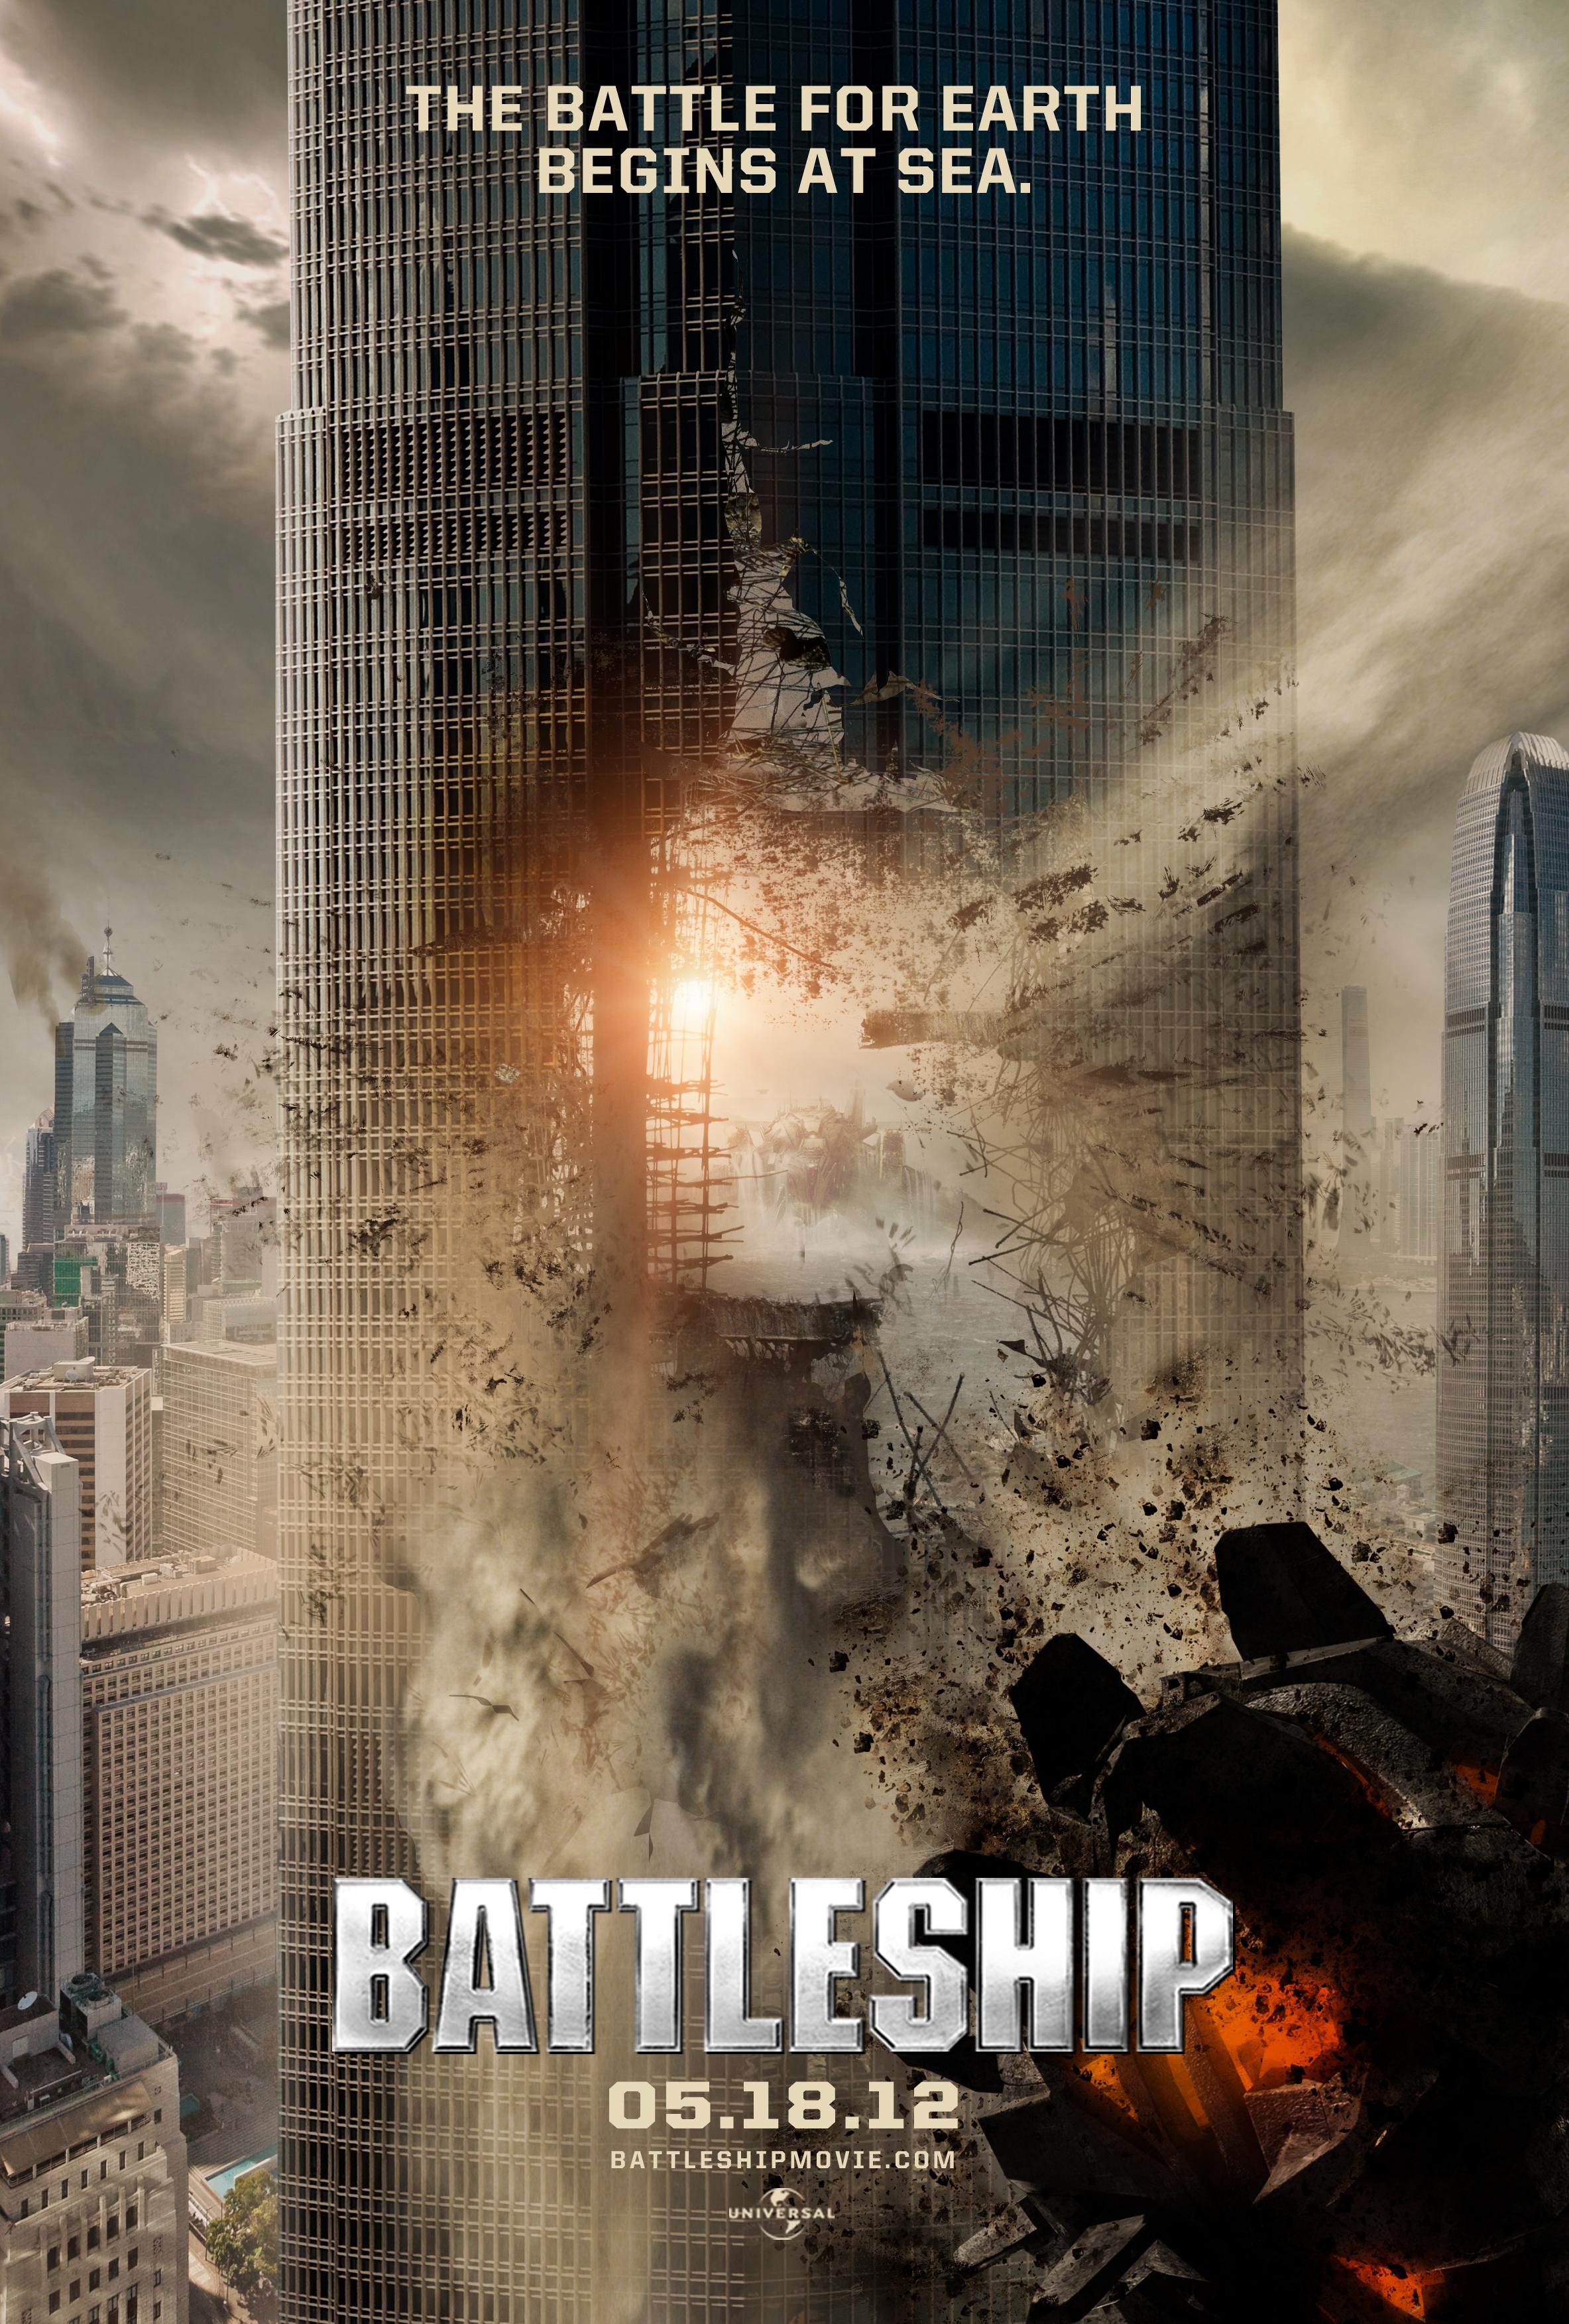 Battleship_21_ps.jpg